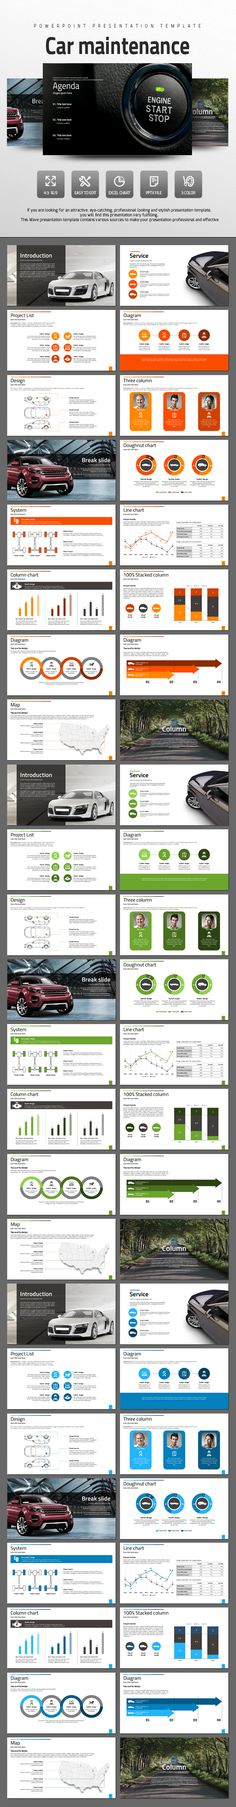 Car Maintenance - PowerPoint Templates Presentation Templates